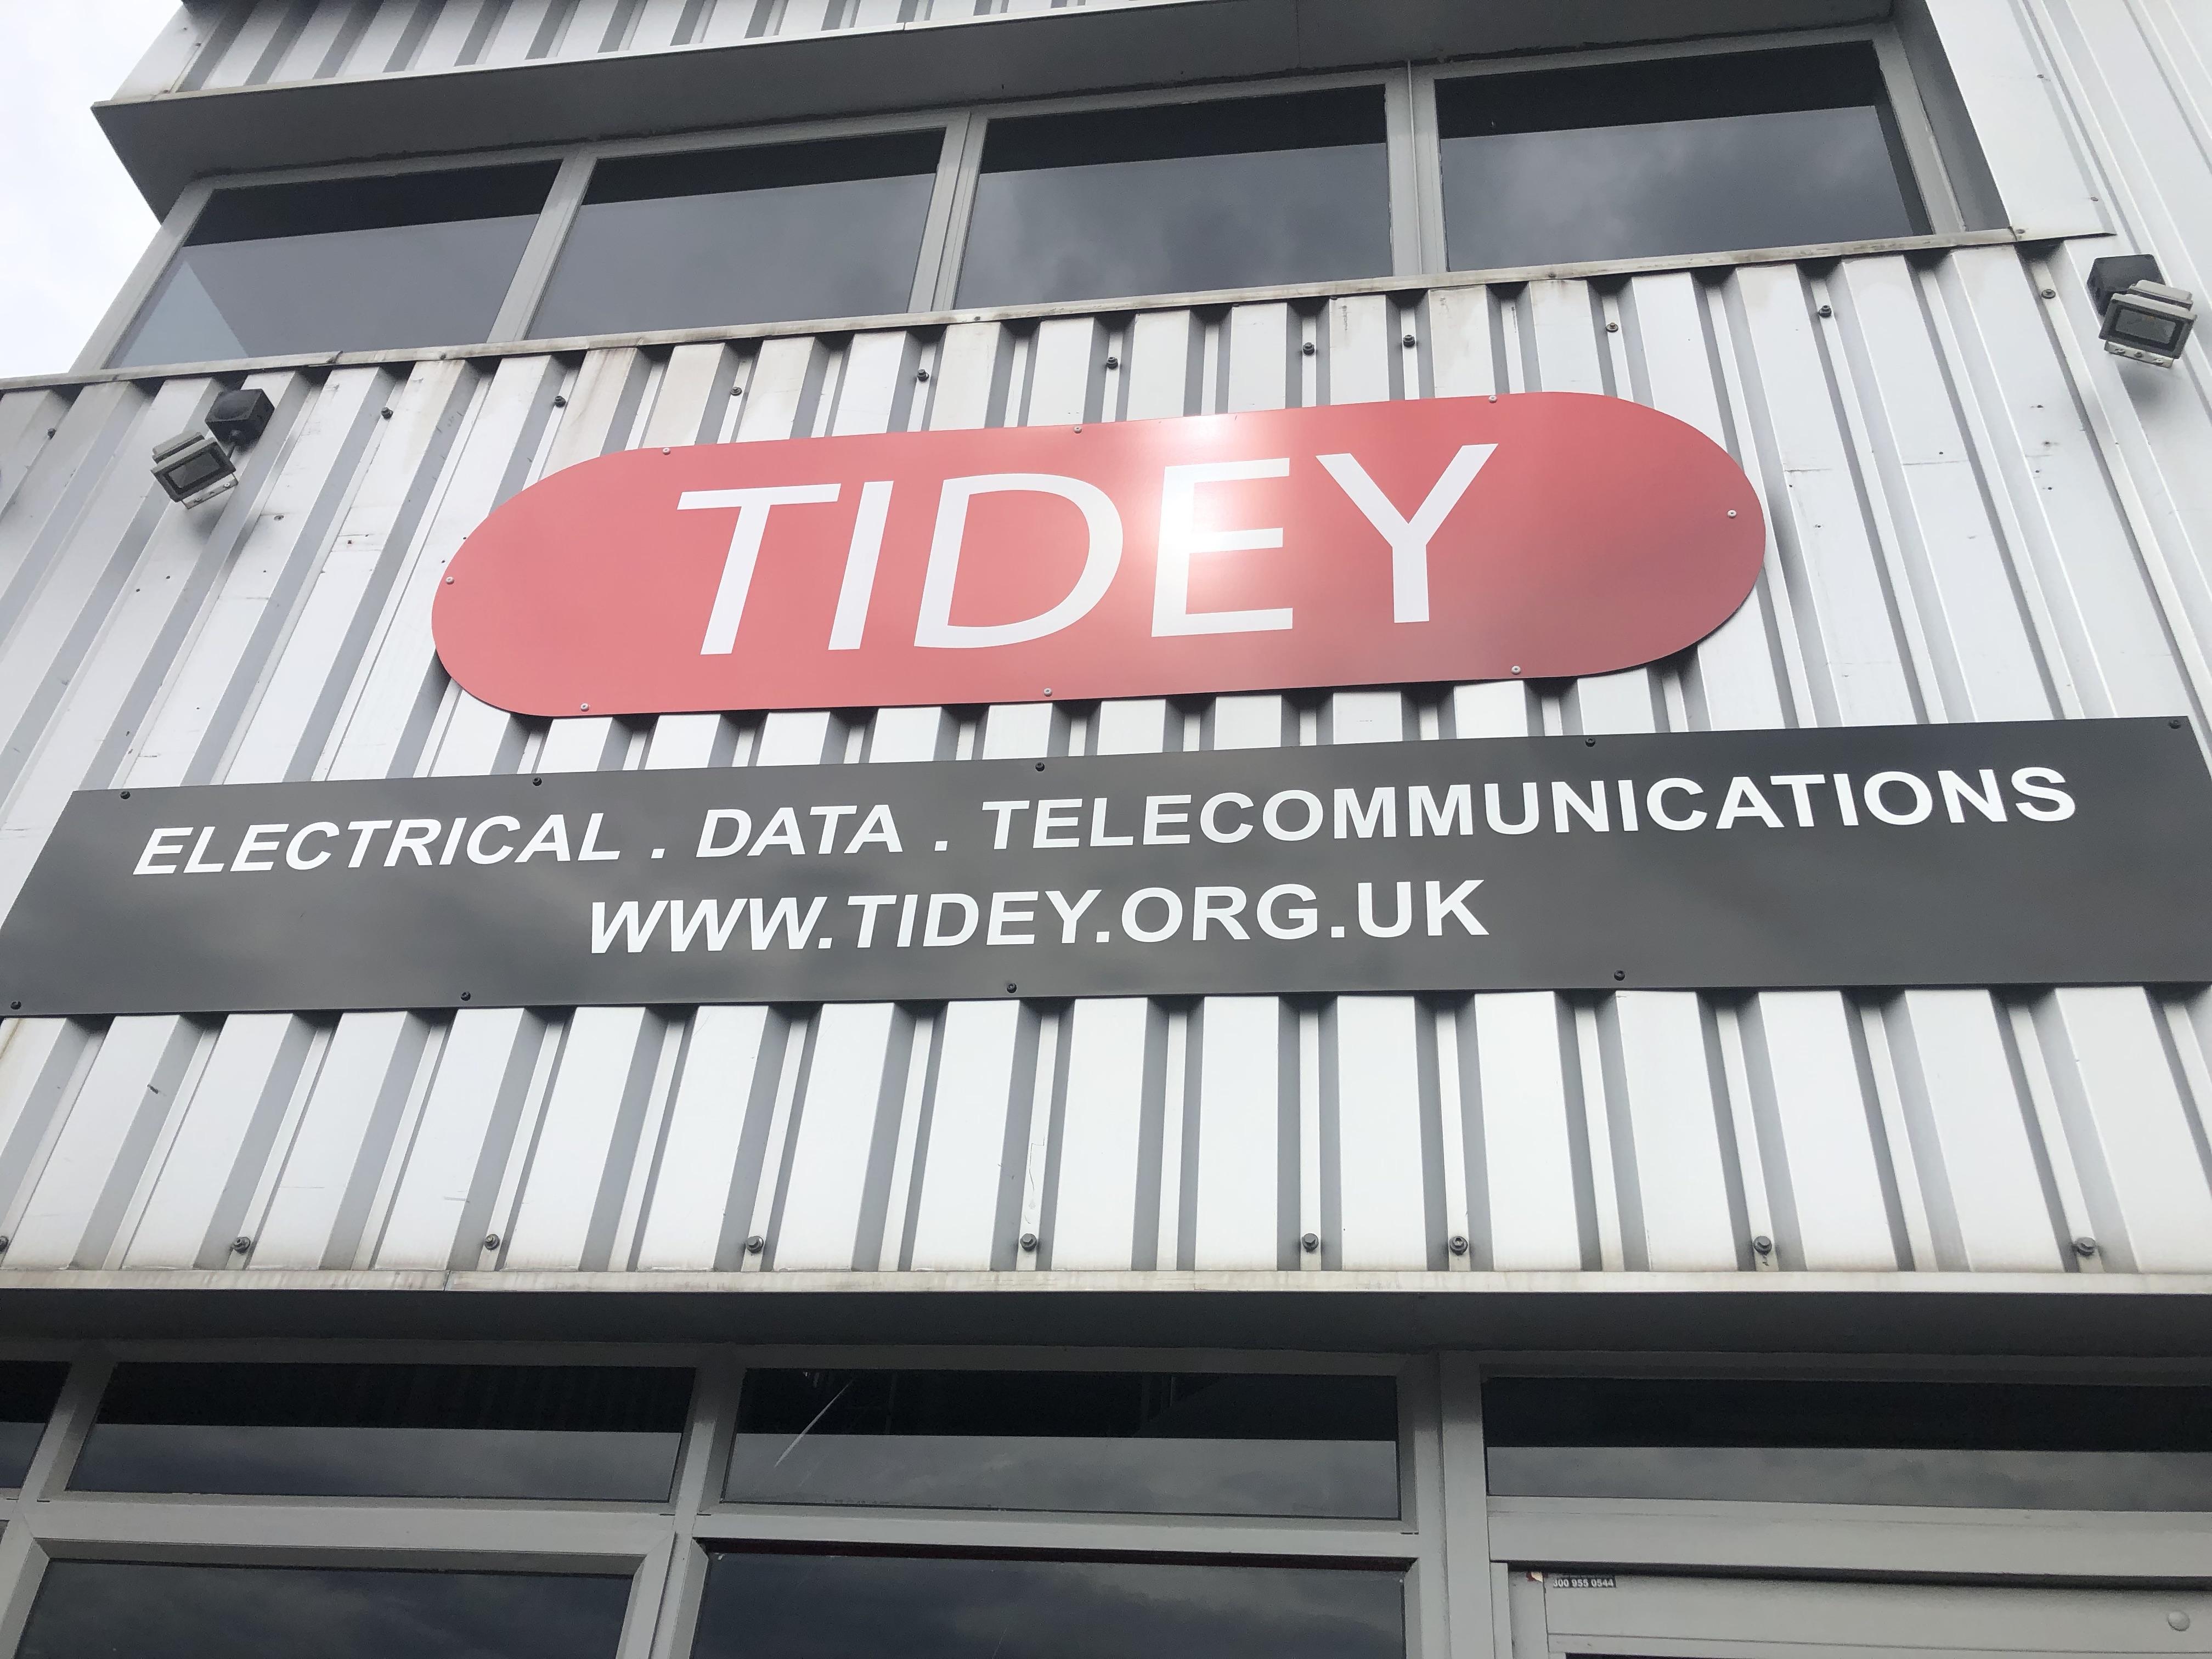 Tidey, Data, Electrical & Telecommunications